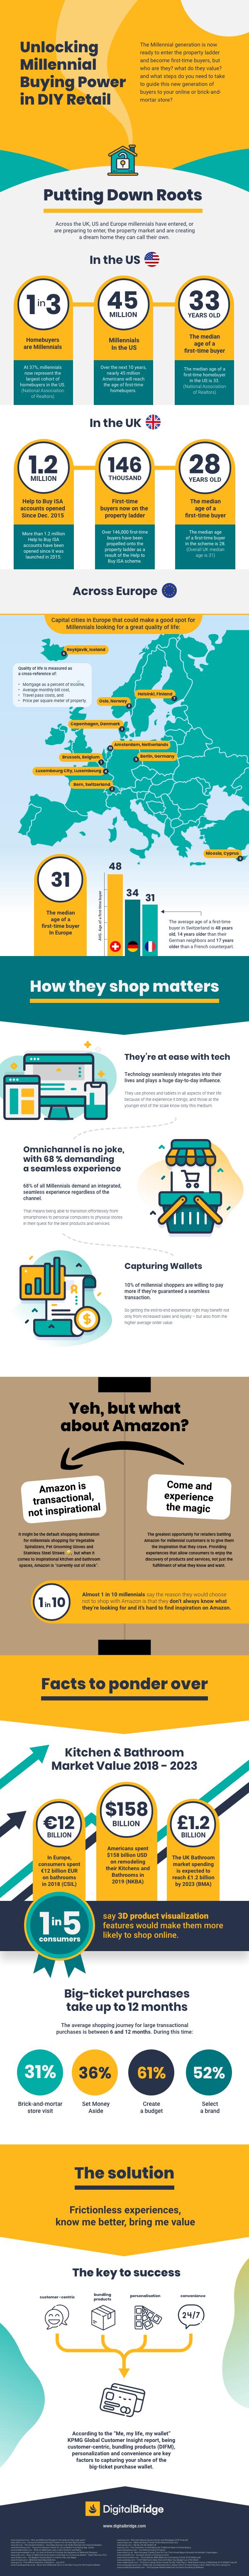 Unlocking Millennial Buying Power in DIY Retail Infographic